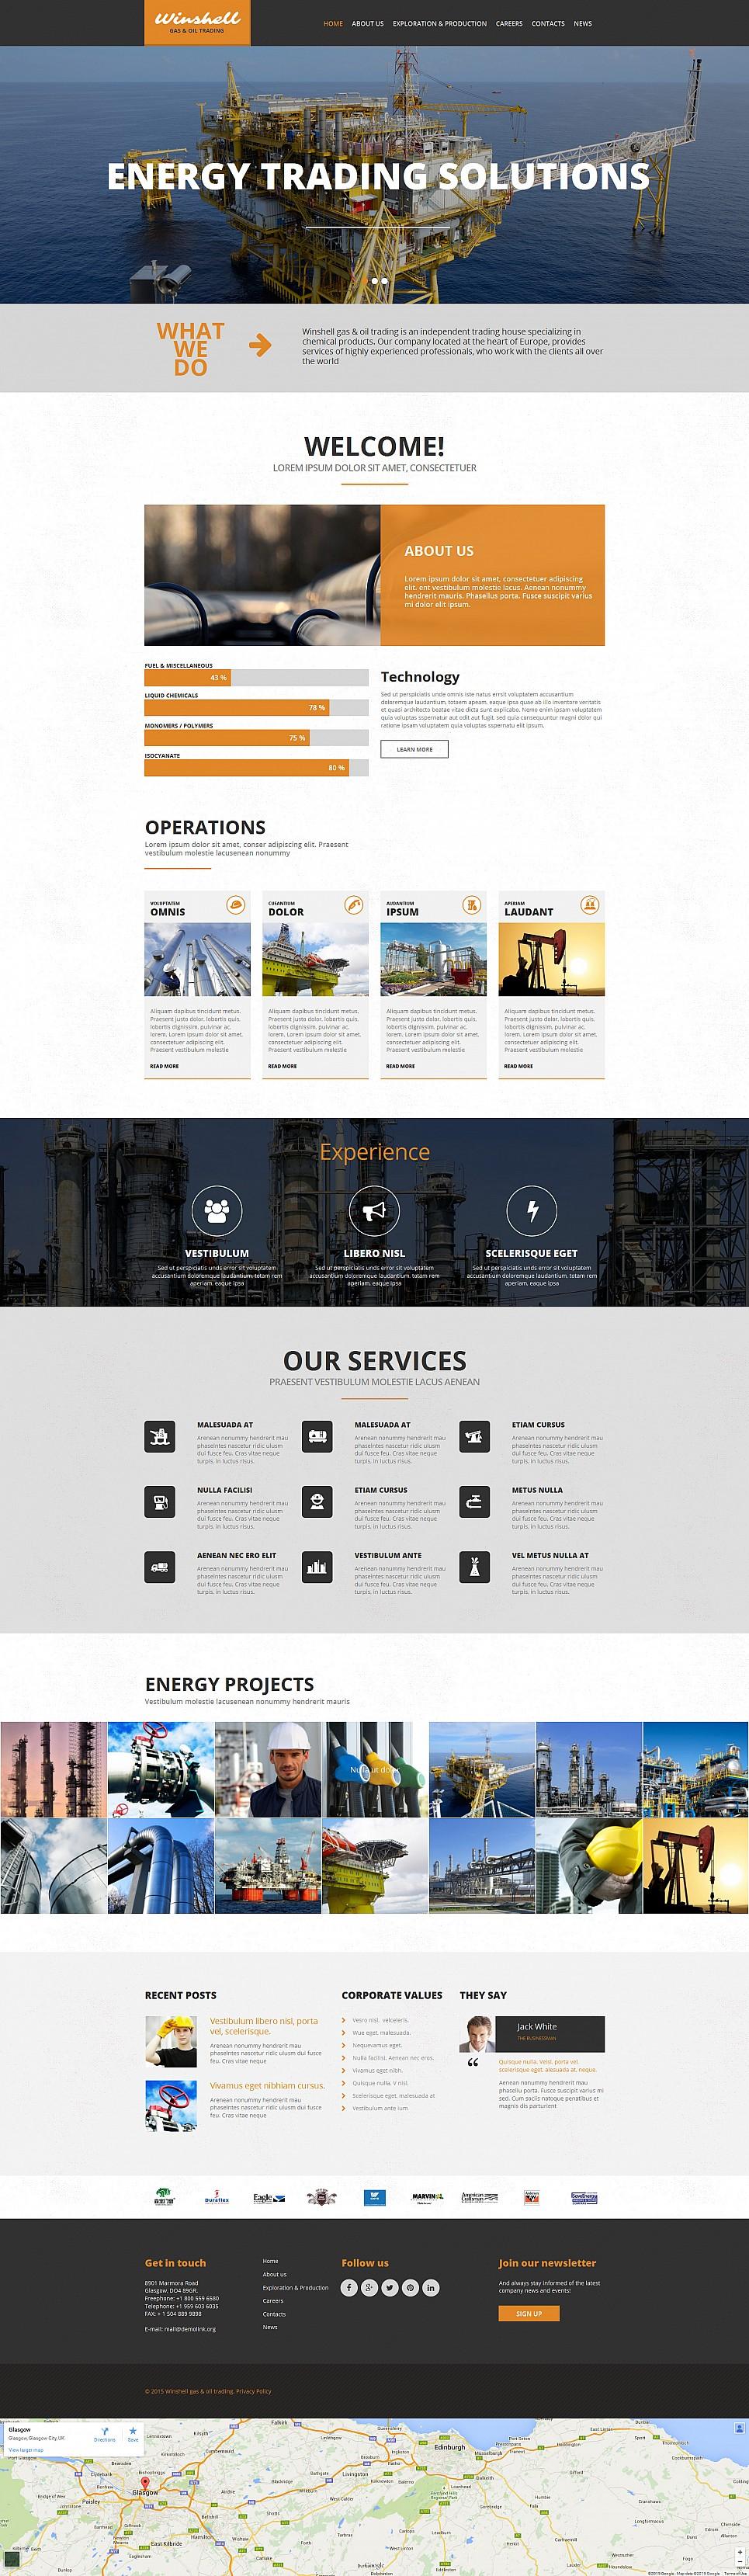 Responsive Industrial Web Theme - image